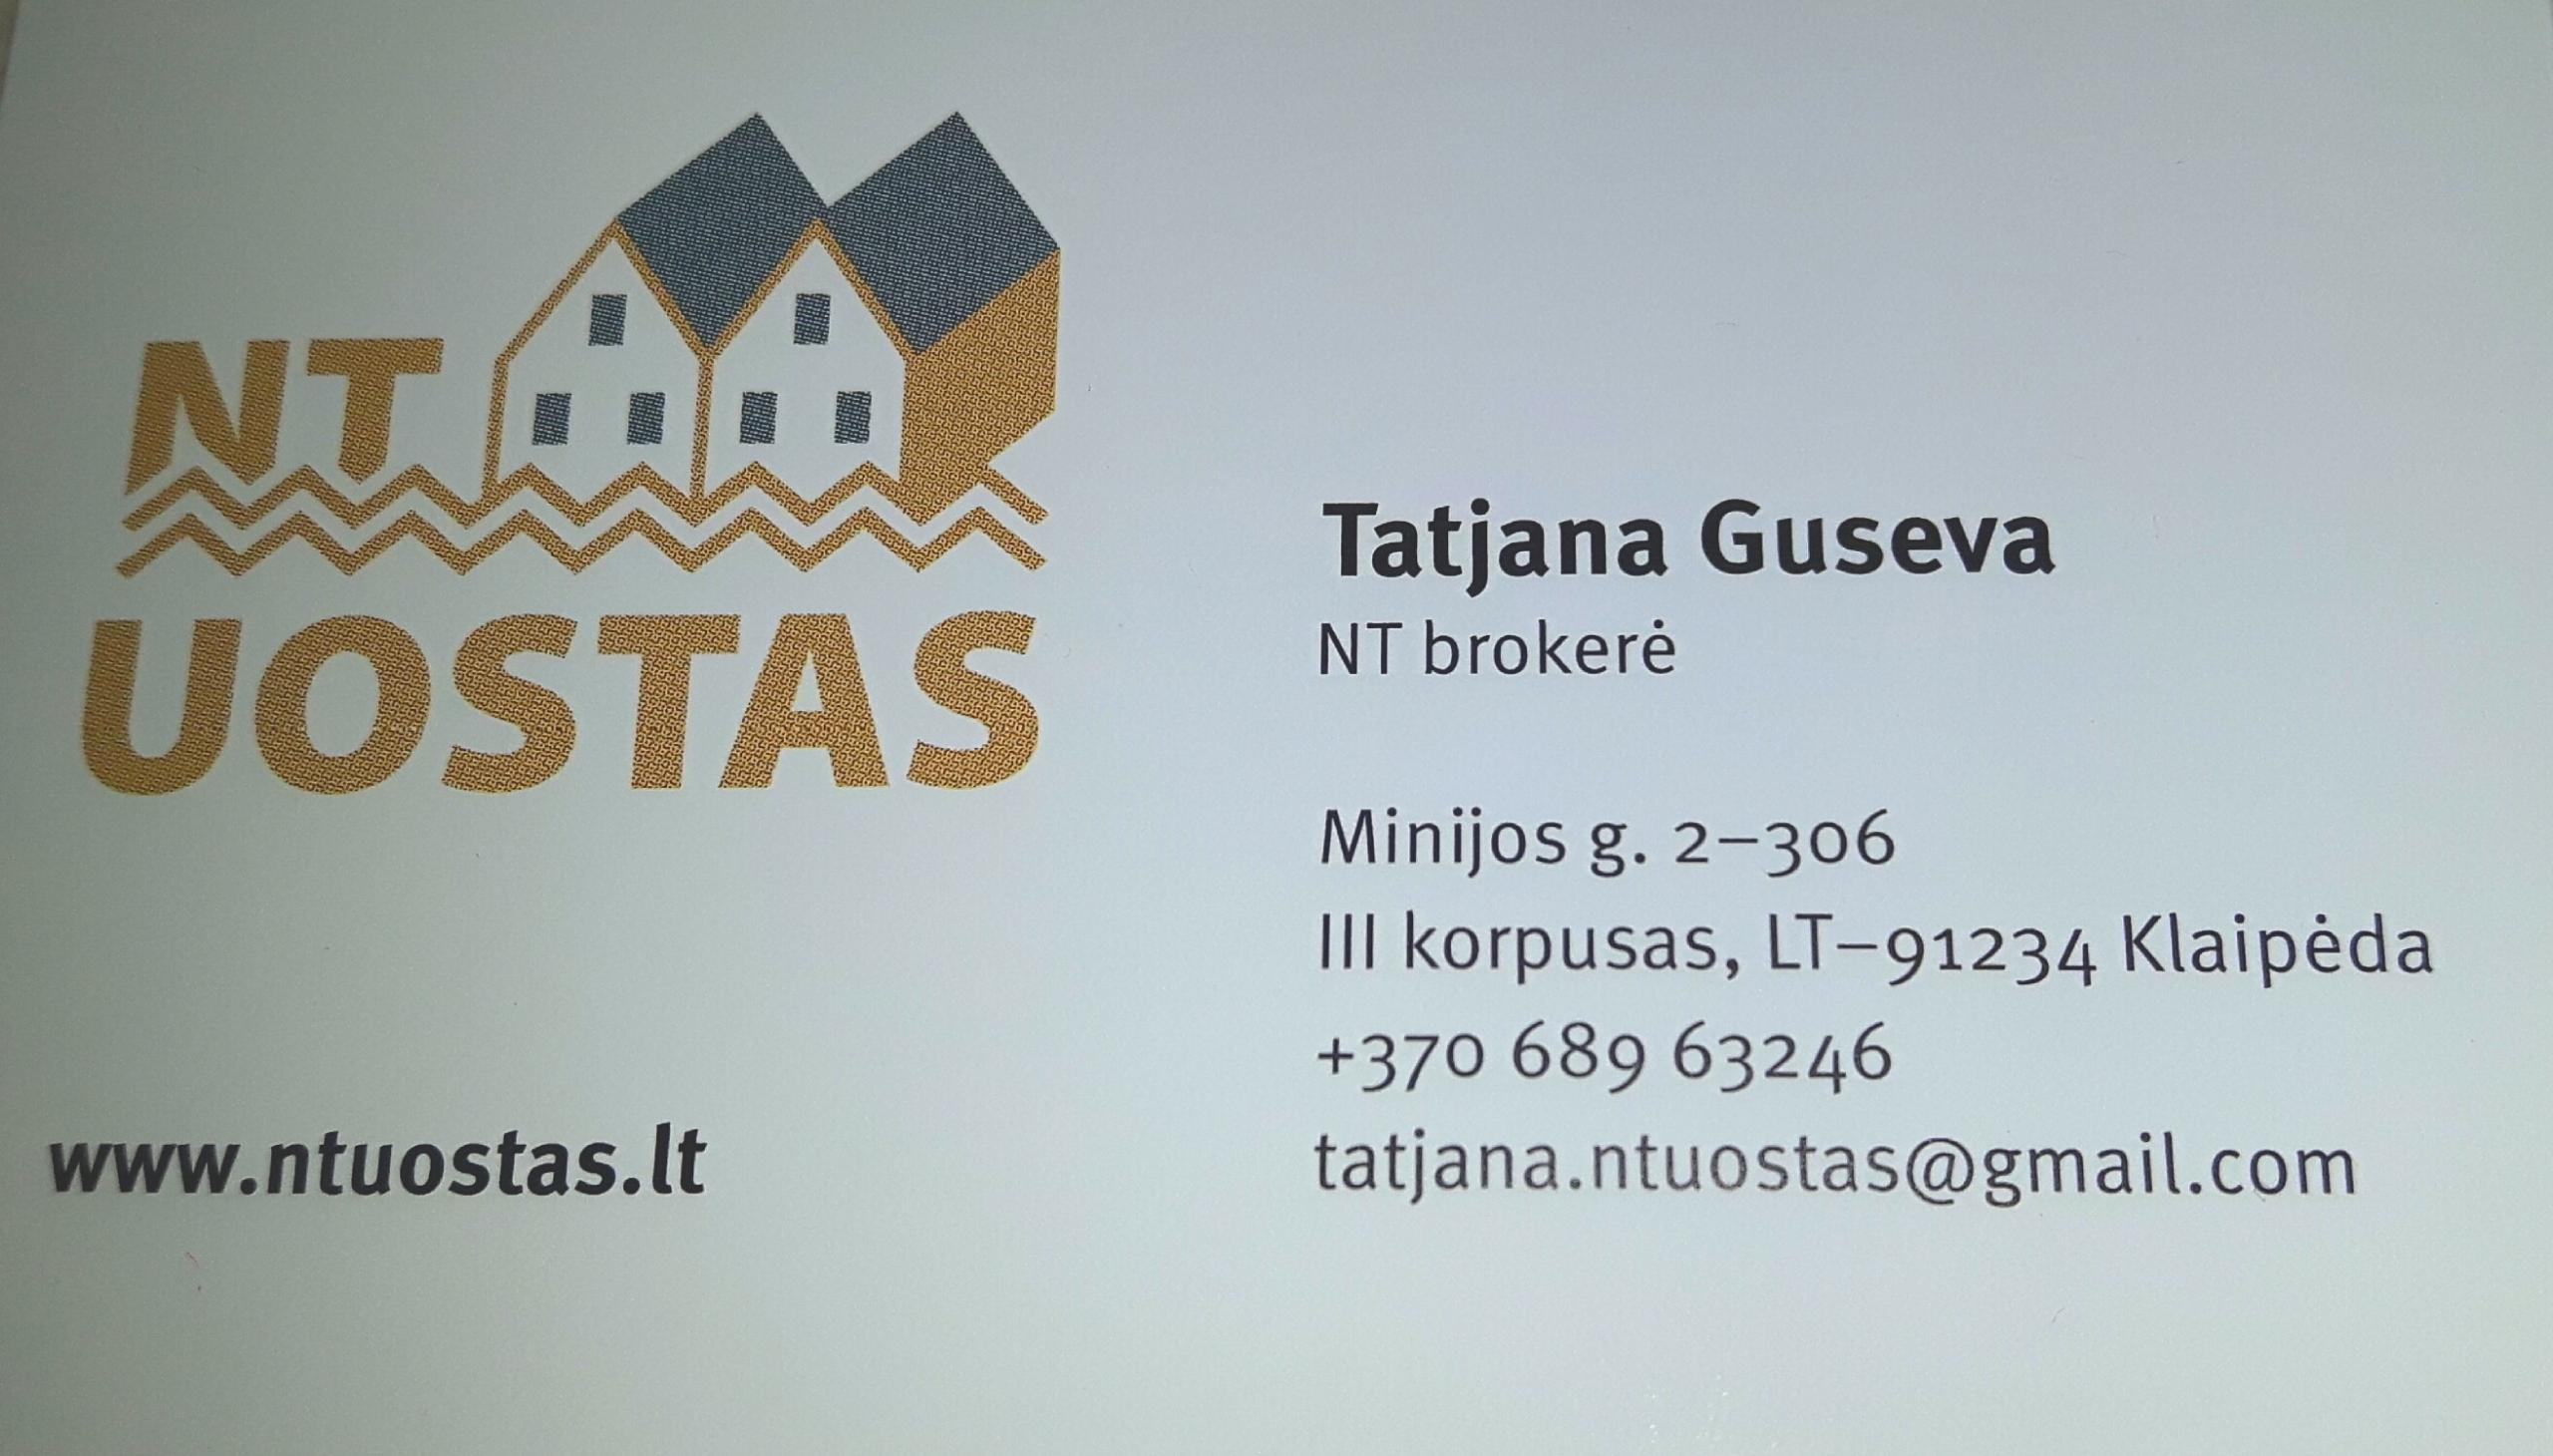 Tatjana Guseva